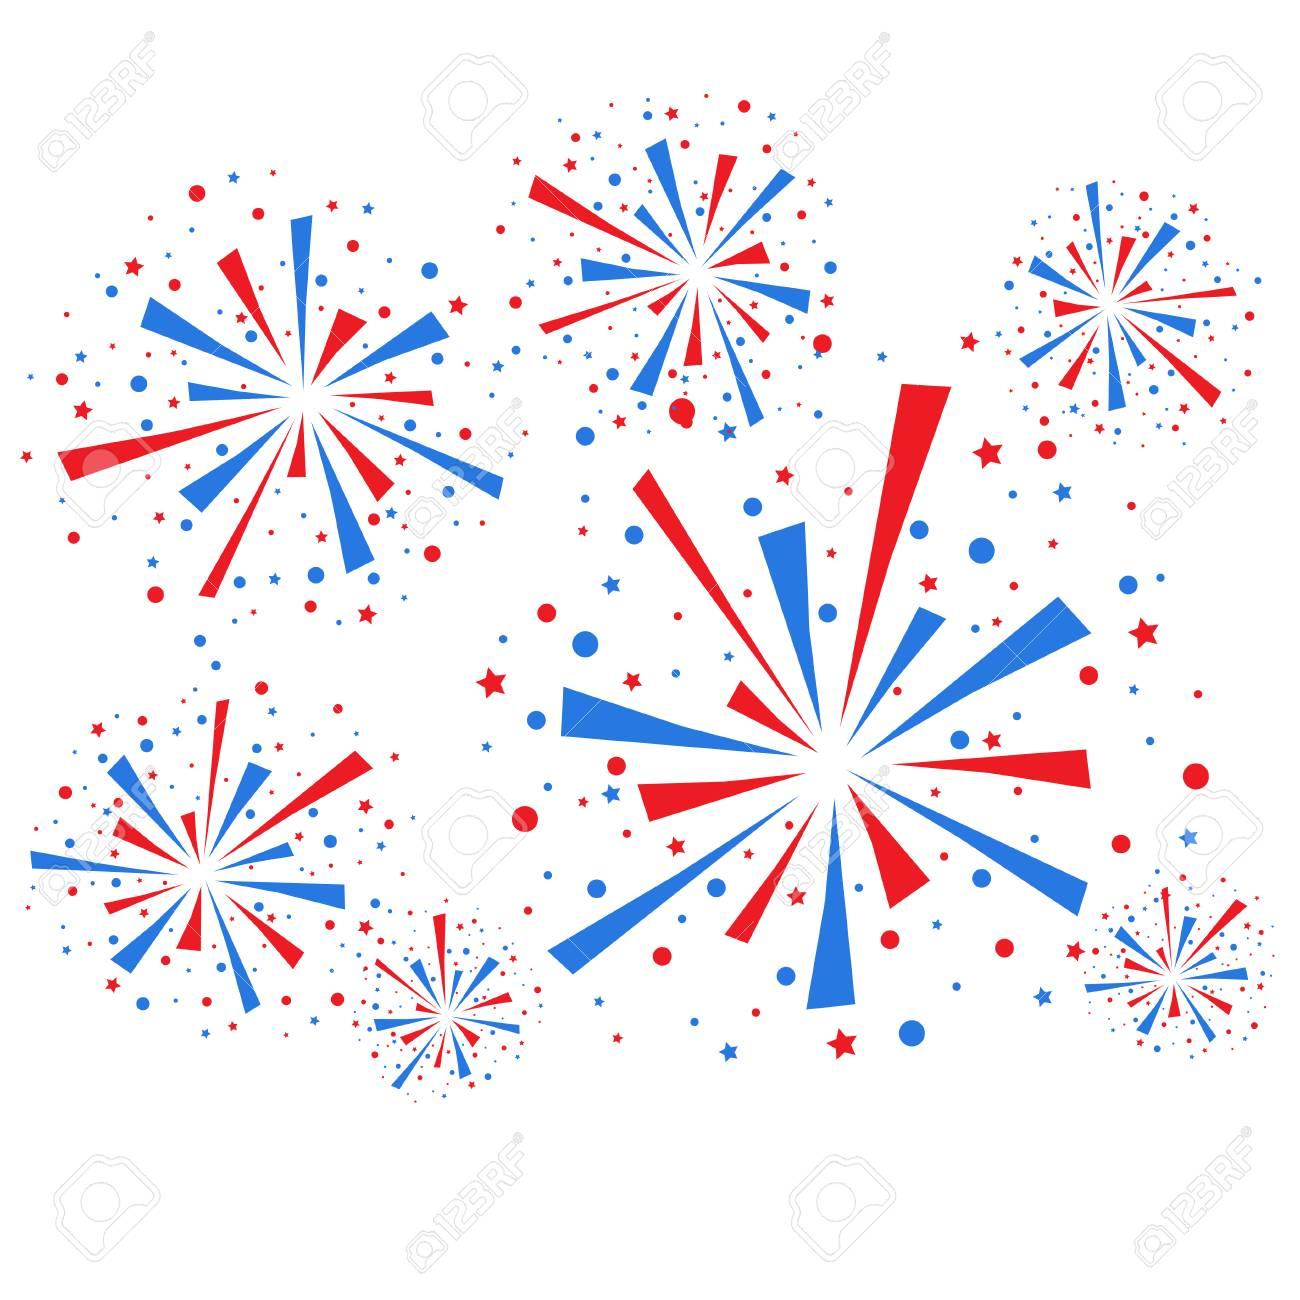 Fireworks - 33898428